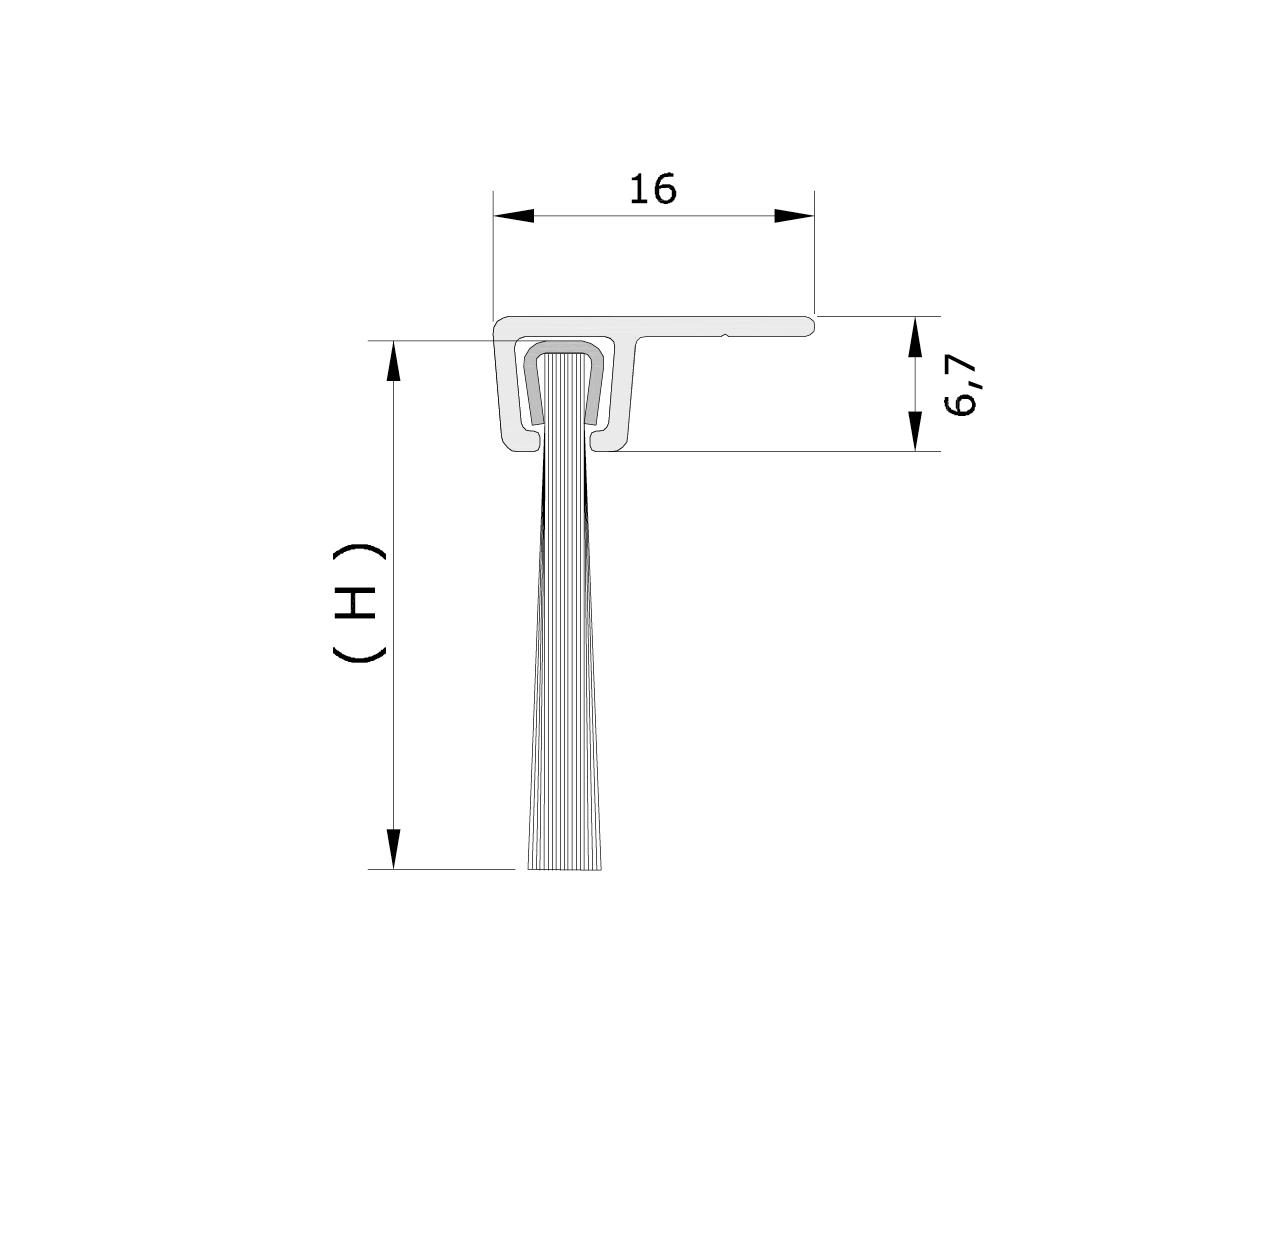 Misure standard (mm) per il paraspifferi Serie Comax 126